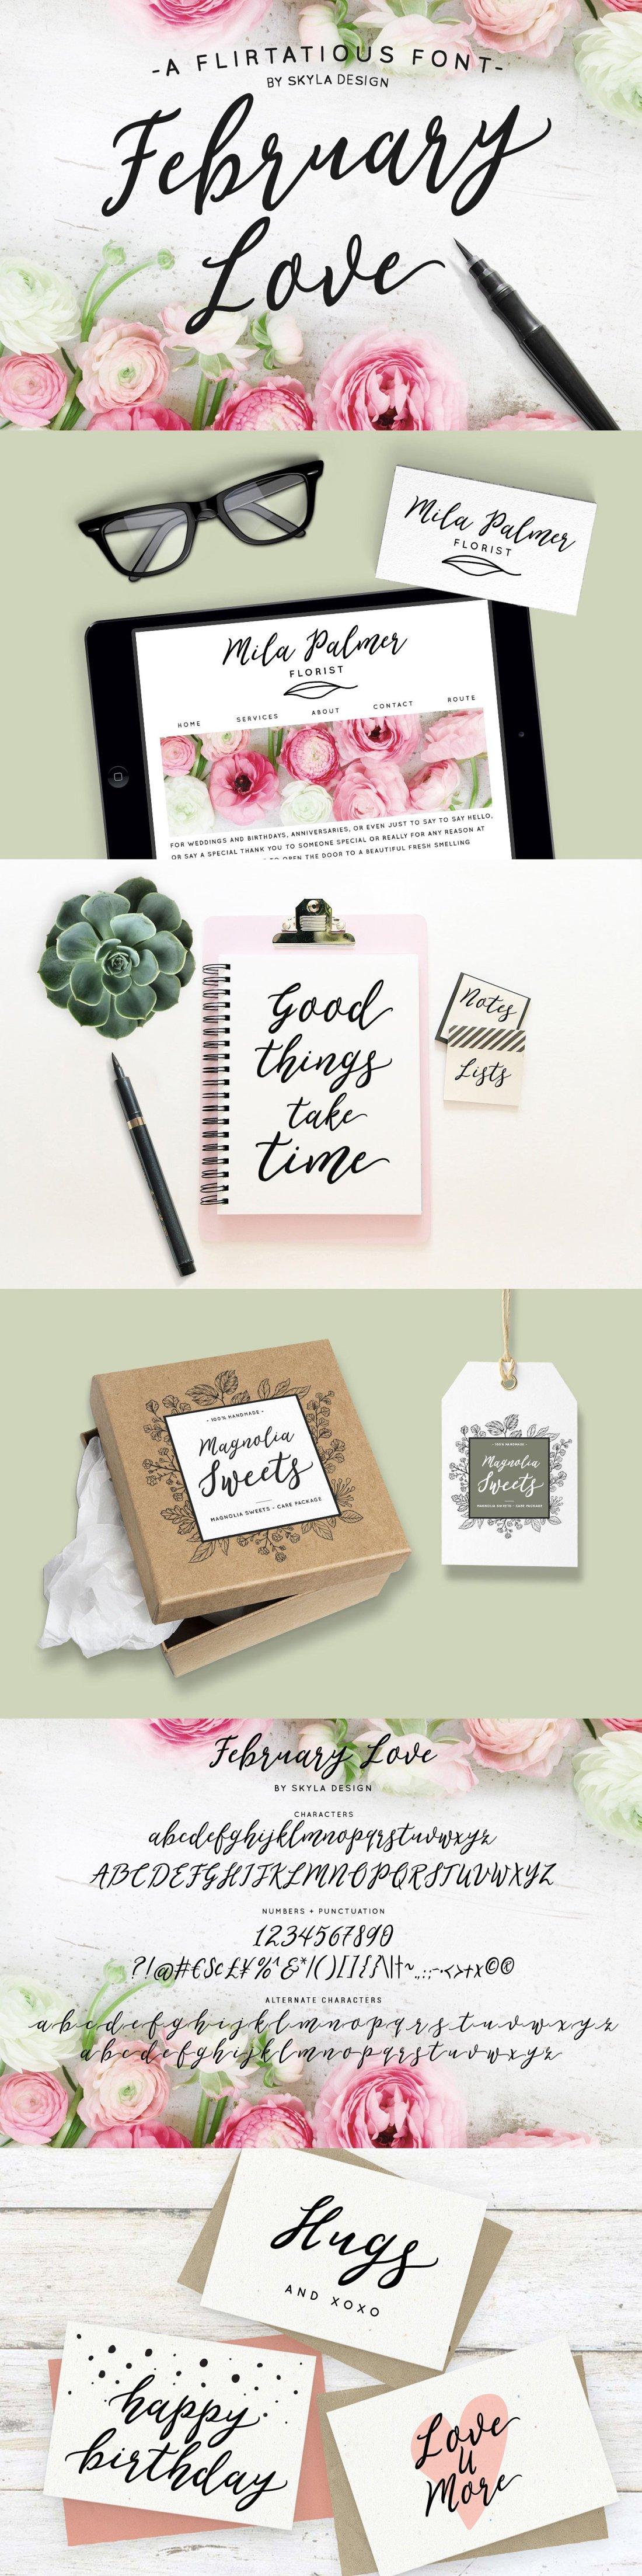 A flirty script font February Love.